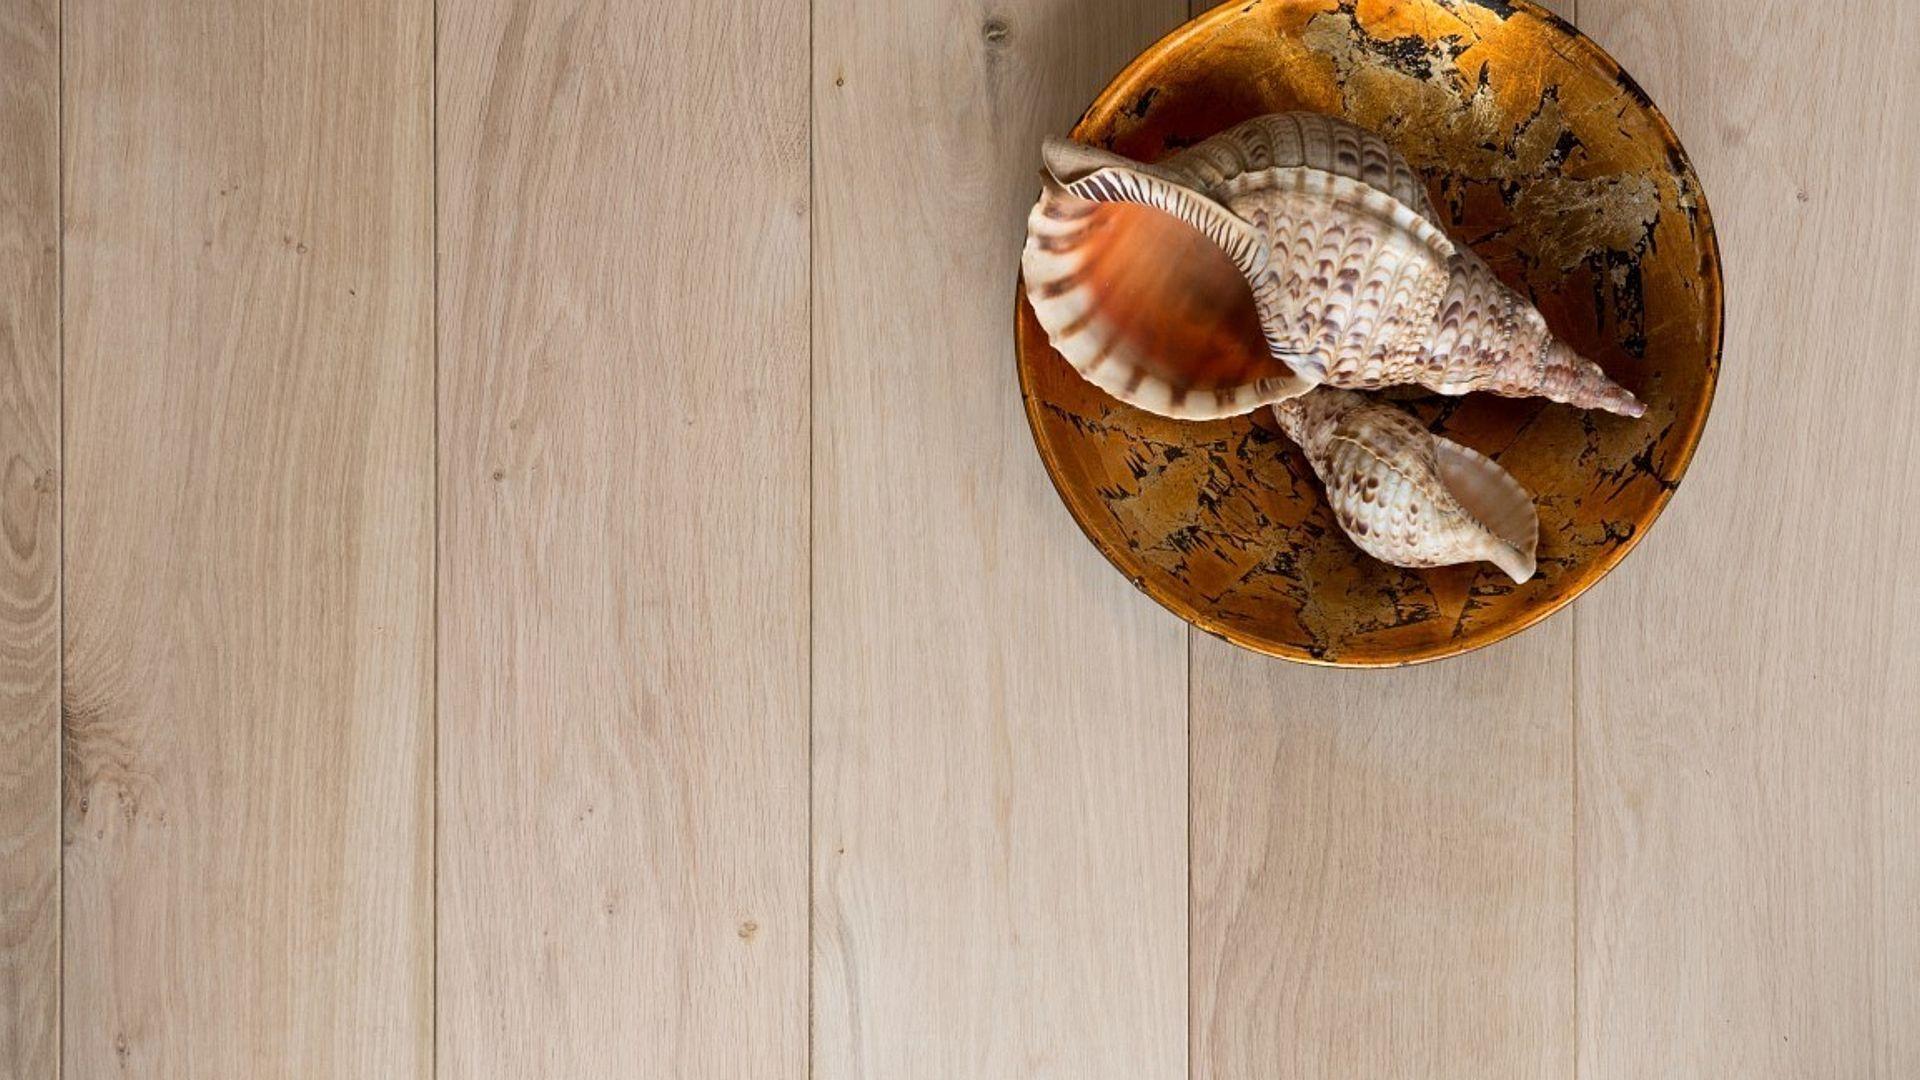 Onbehandelde Houten Vloer : Vloer riga vloeren kozijnen